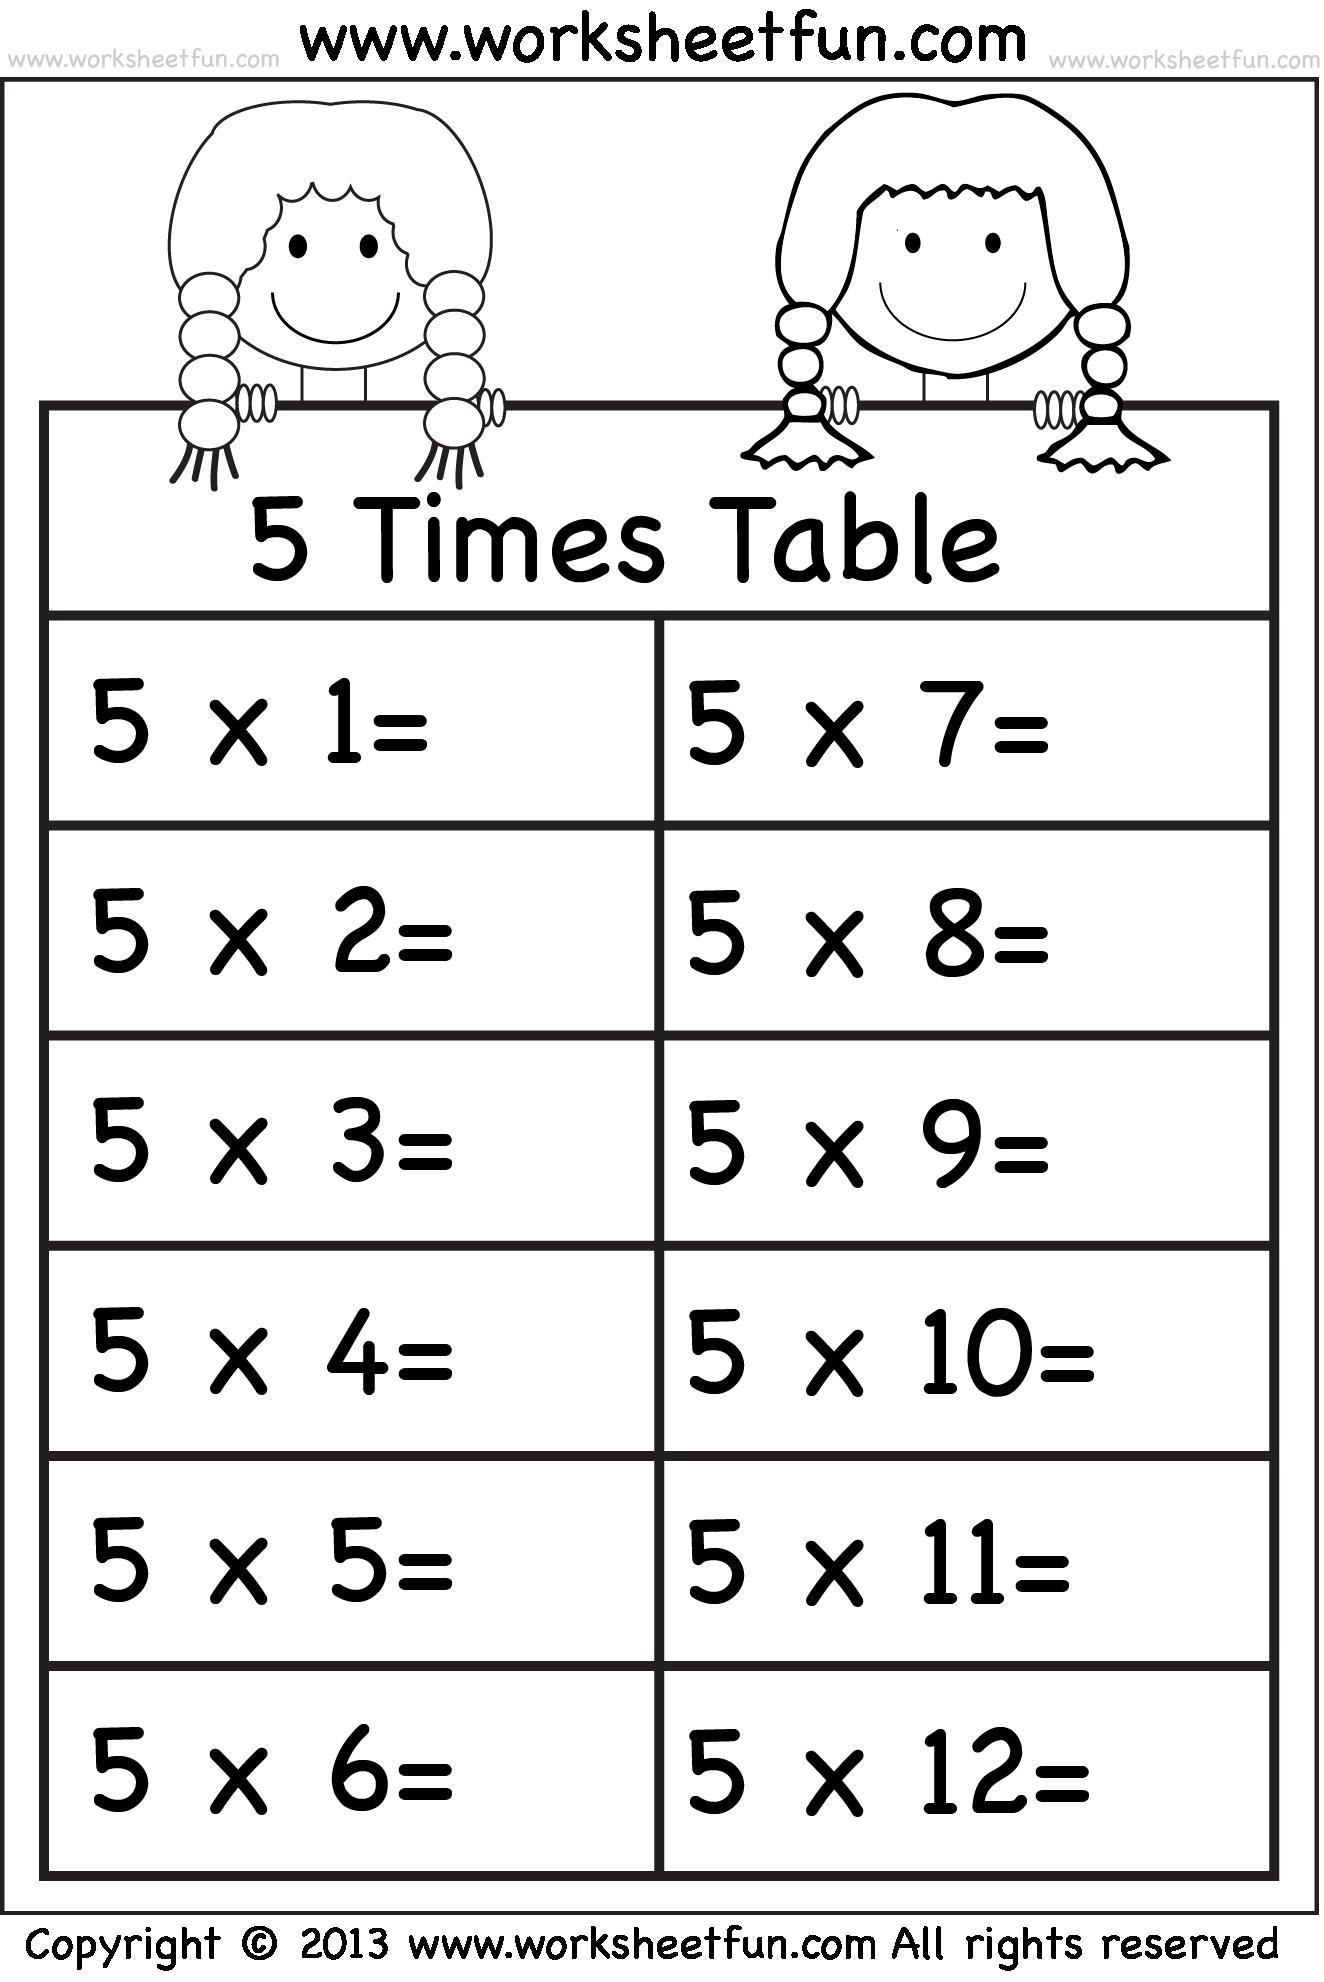 Multiplication Worksheets 5 Times Tables  1419816